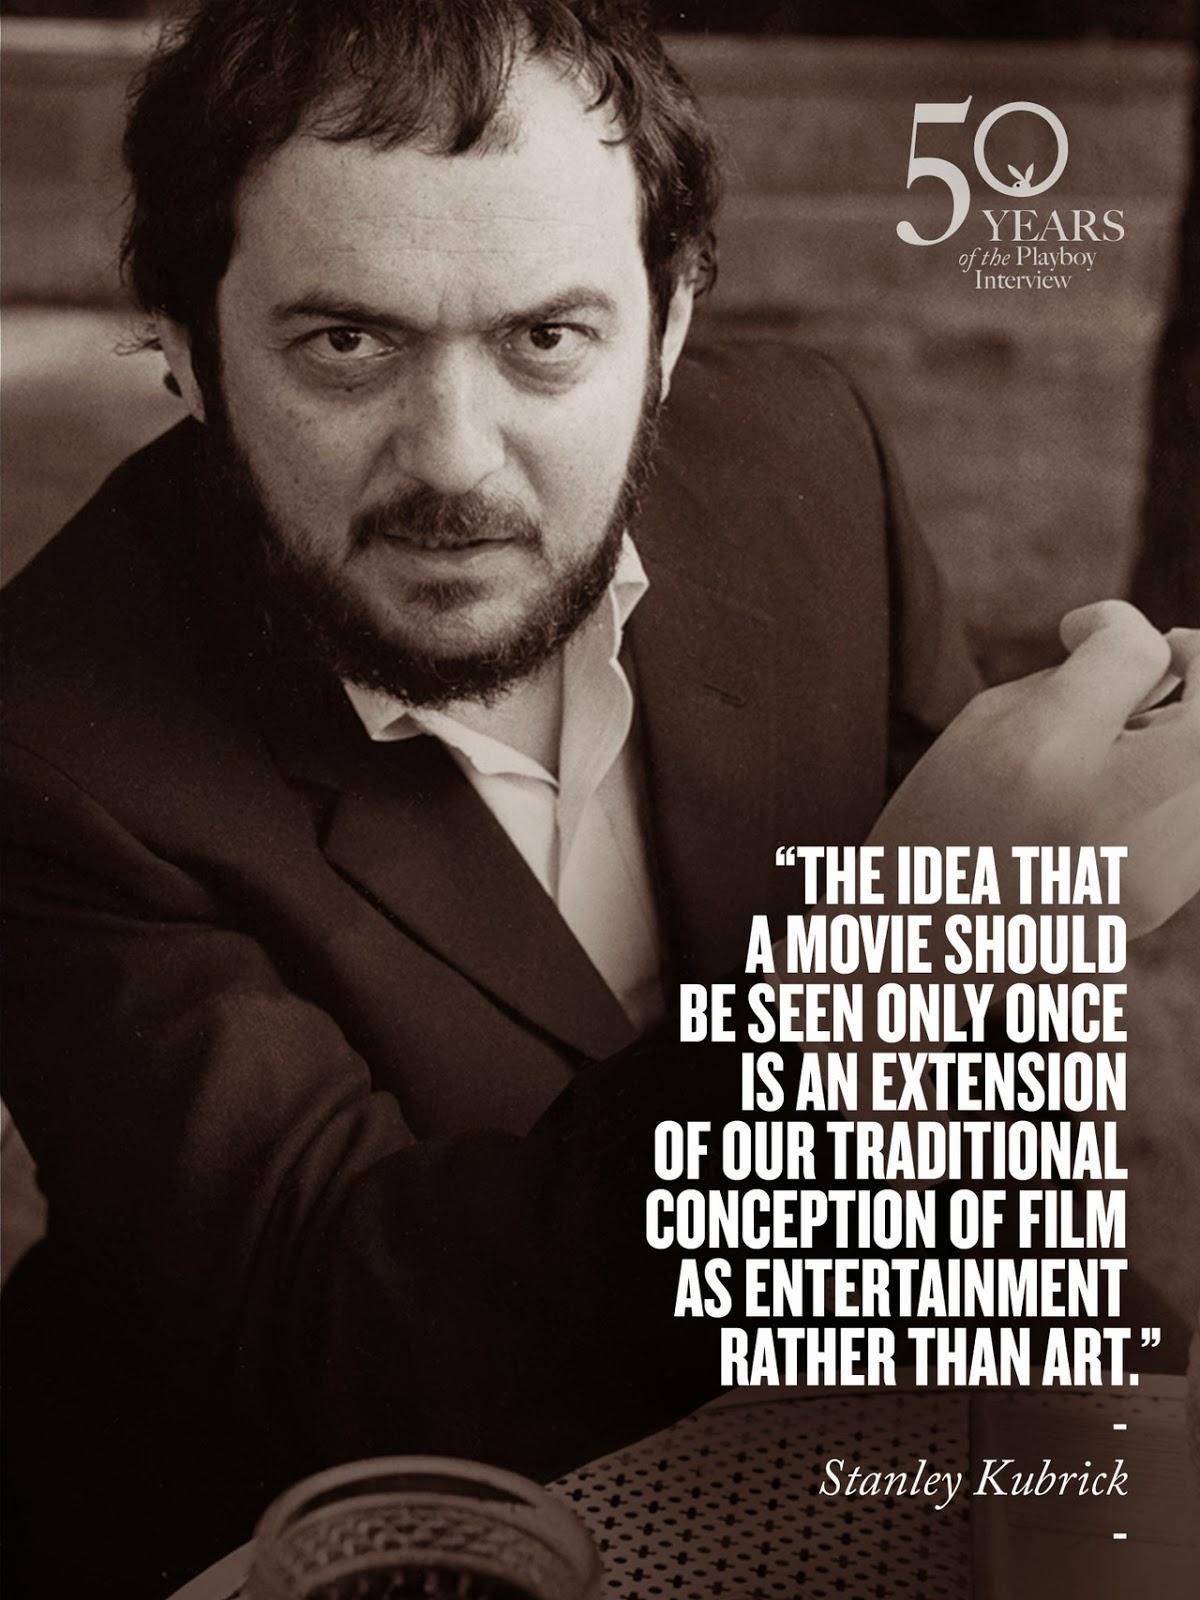 Stanley Kubrick oscars